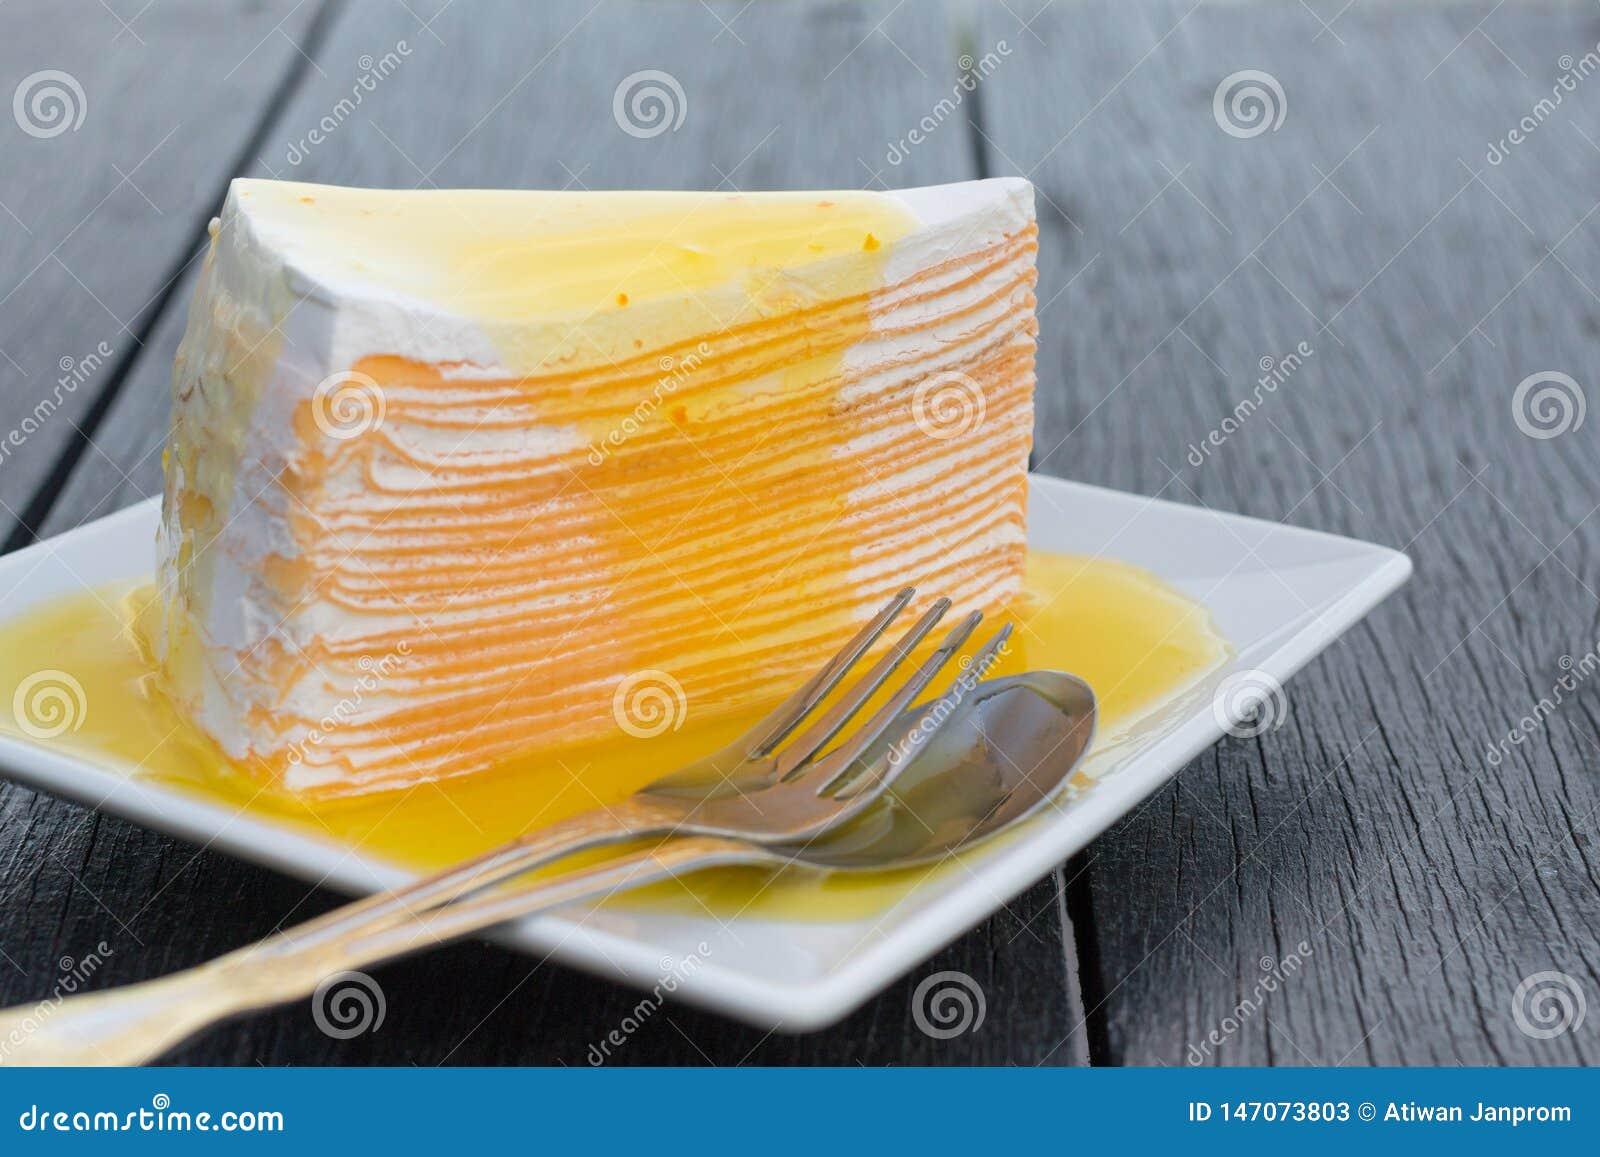 Orange crepe cake in white dish on black wooden table